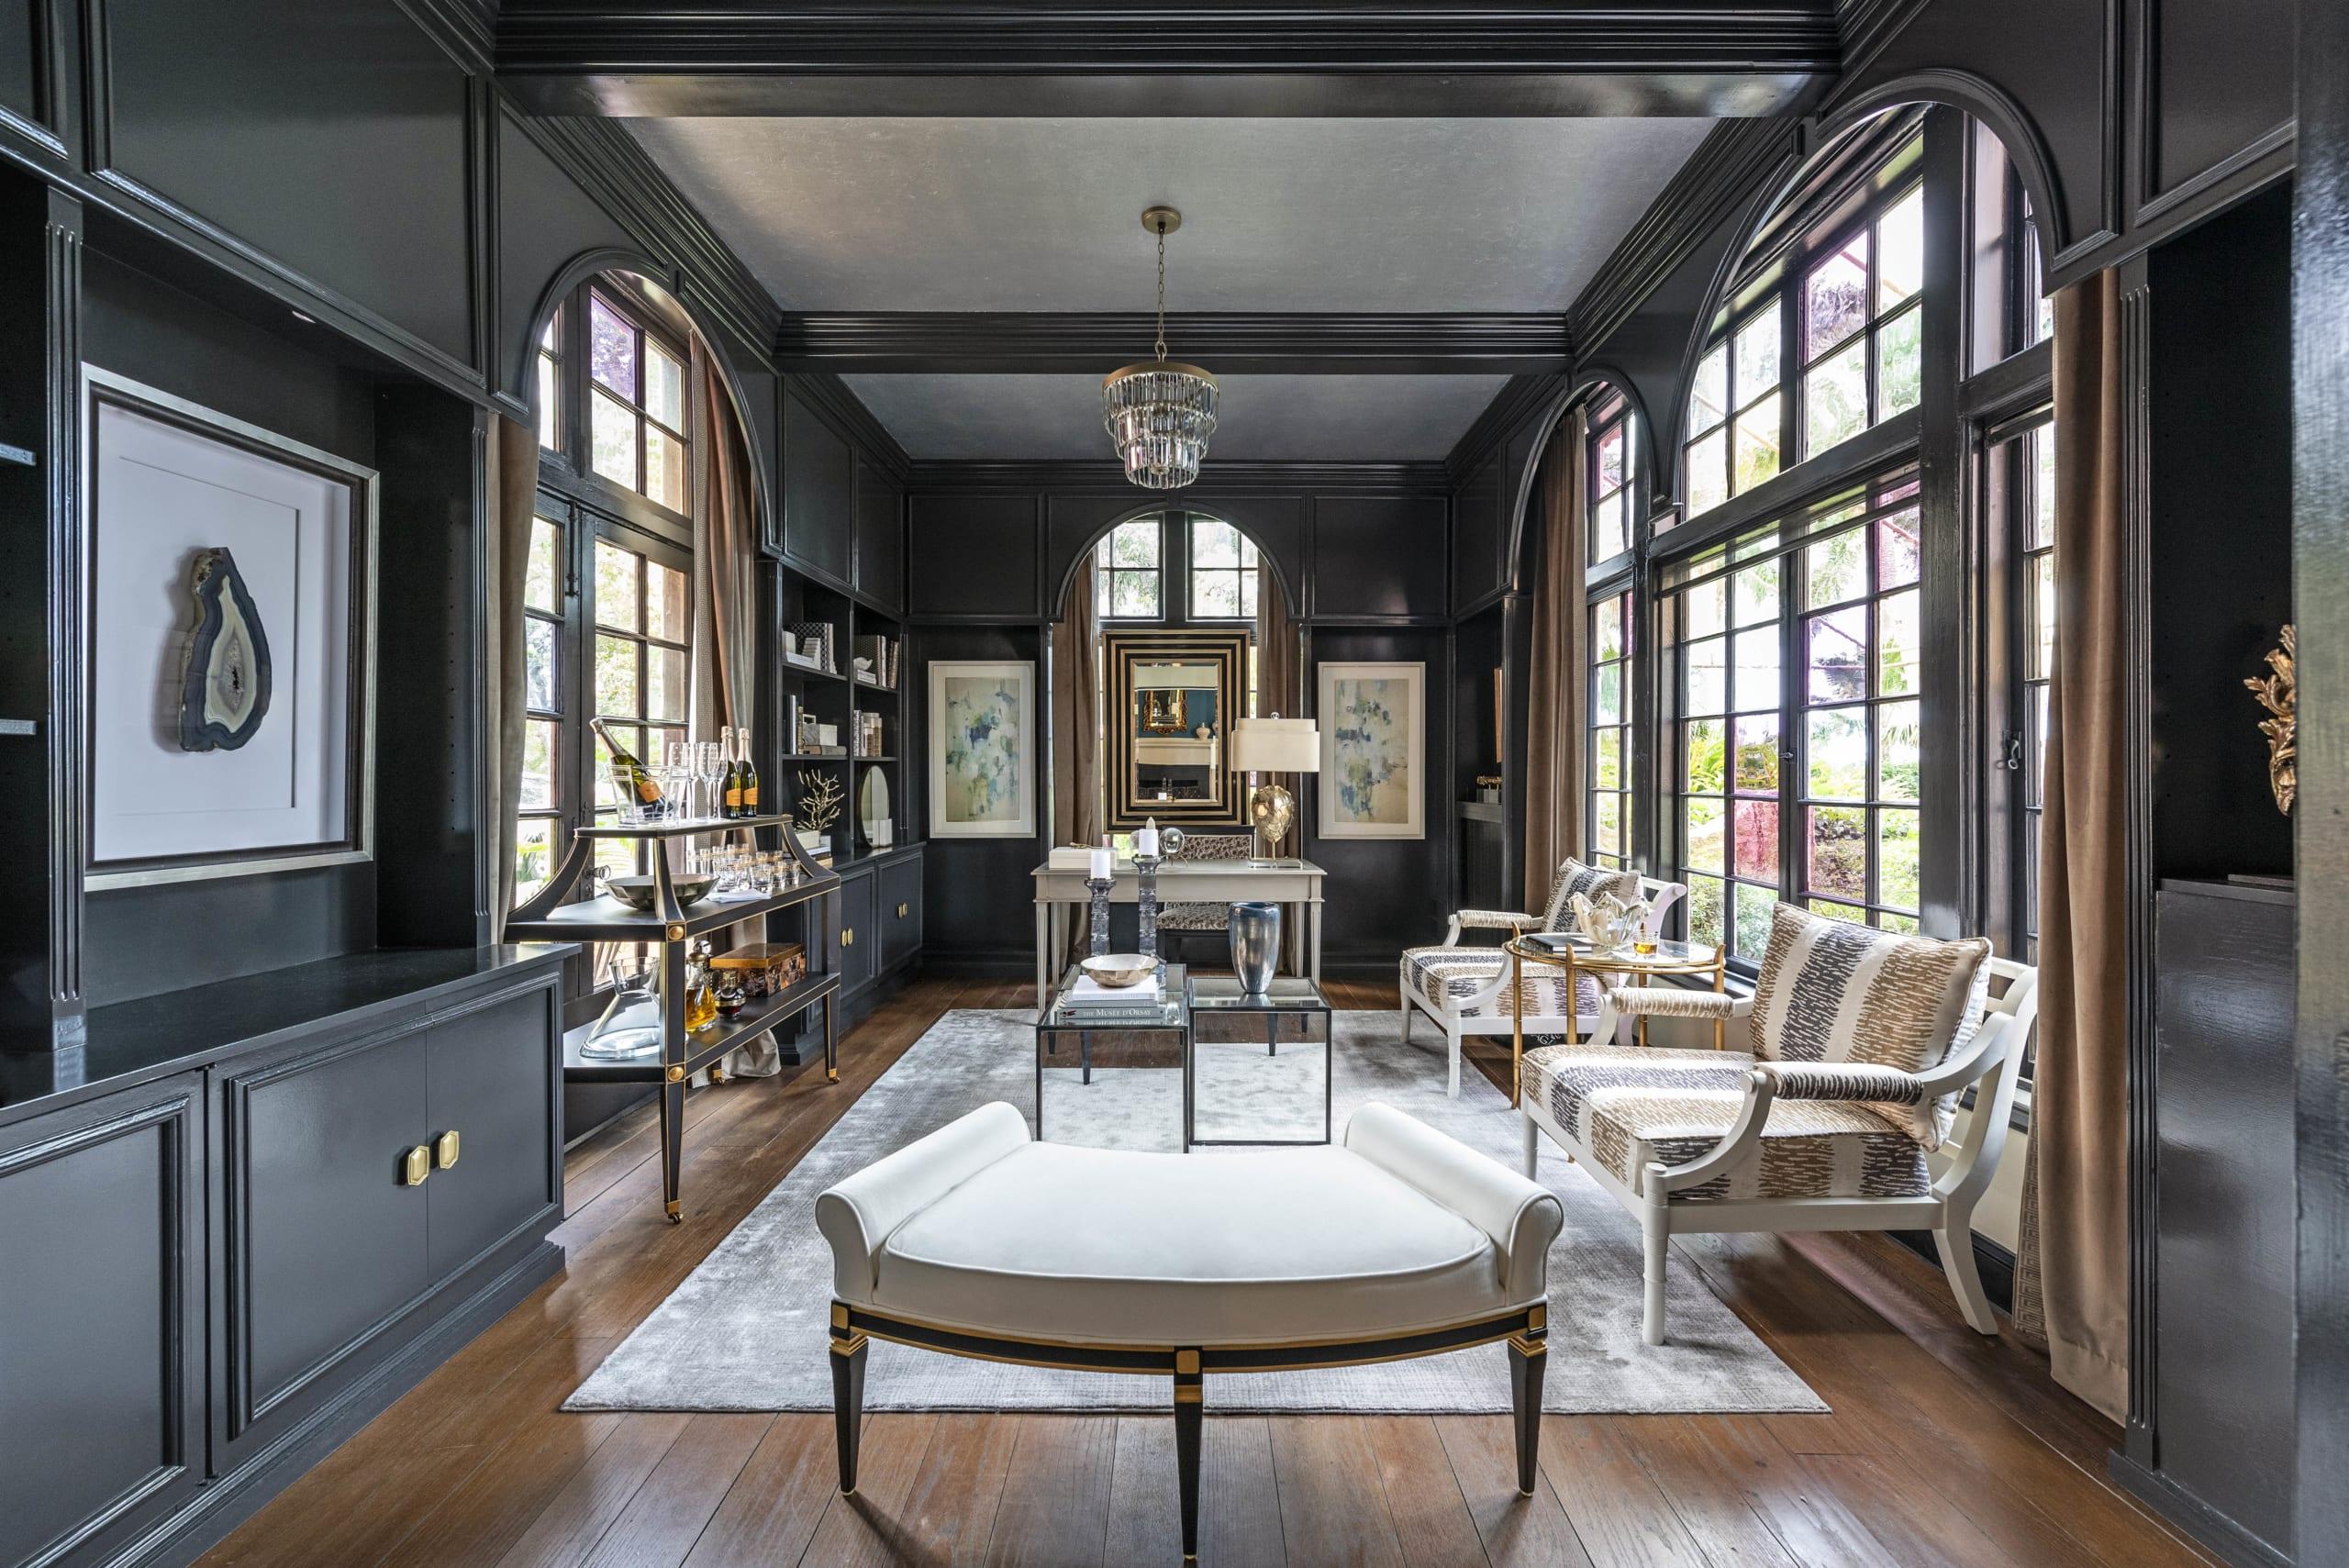 Kristin Pantone Black Interior Silver Ceiling Dark Wood Floors